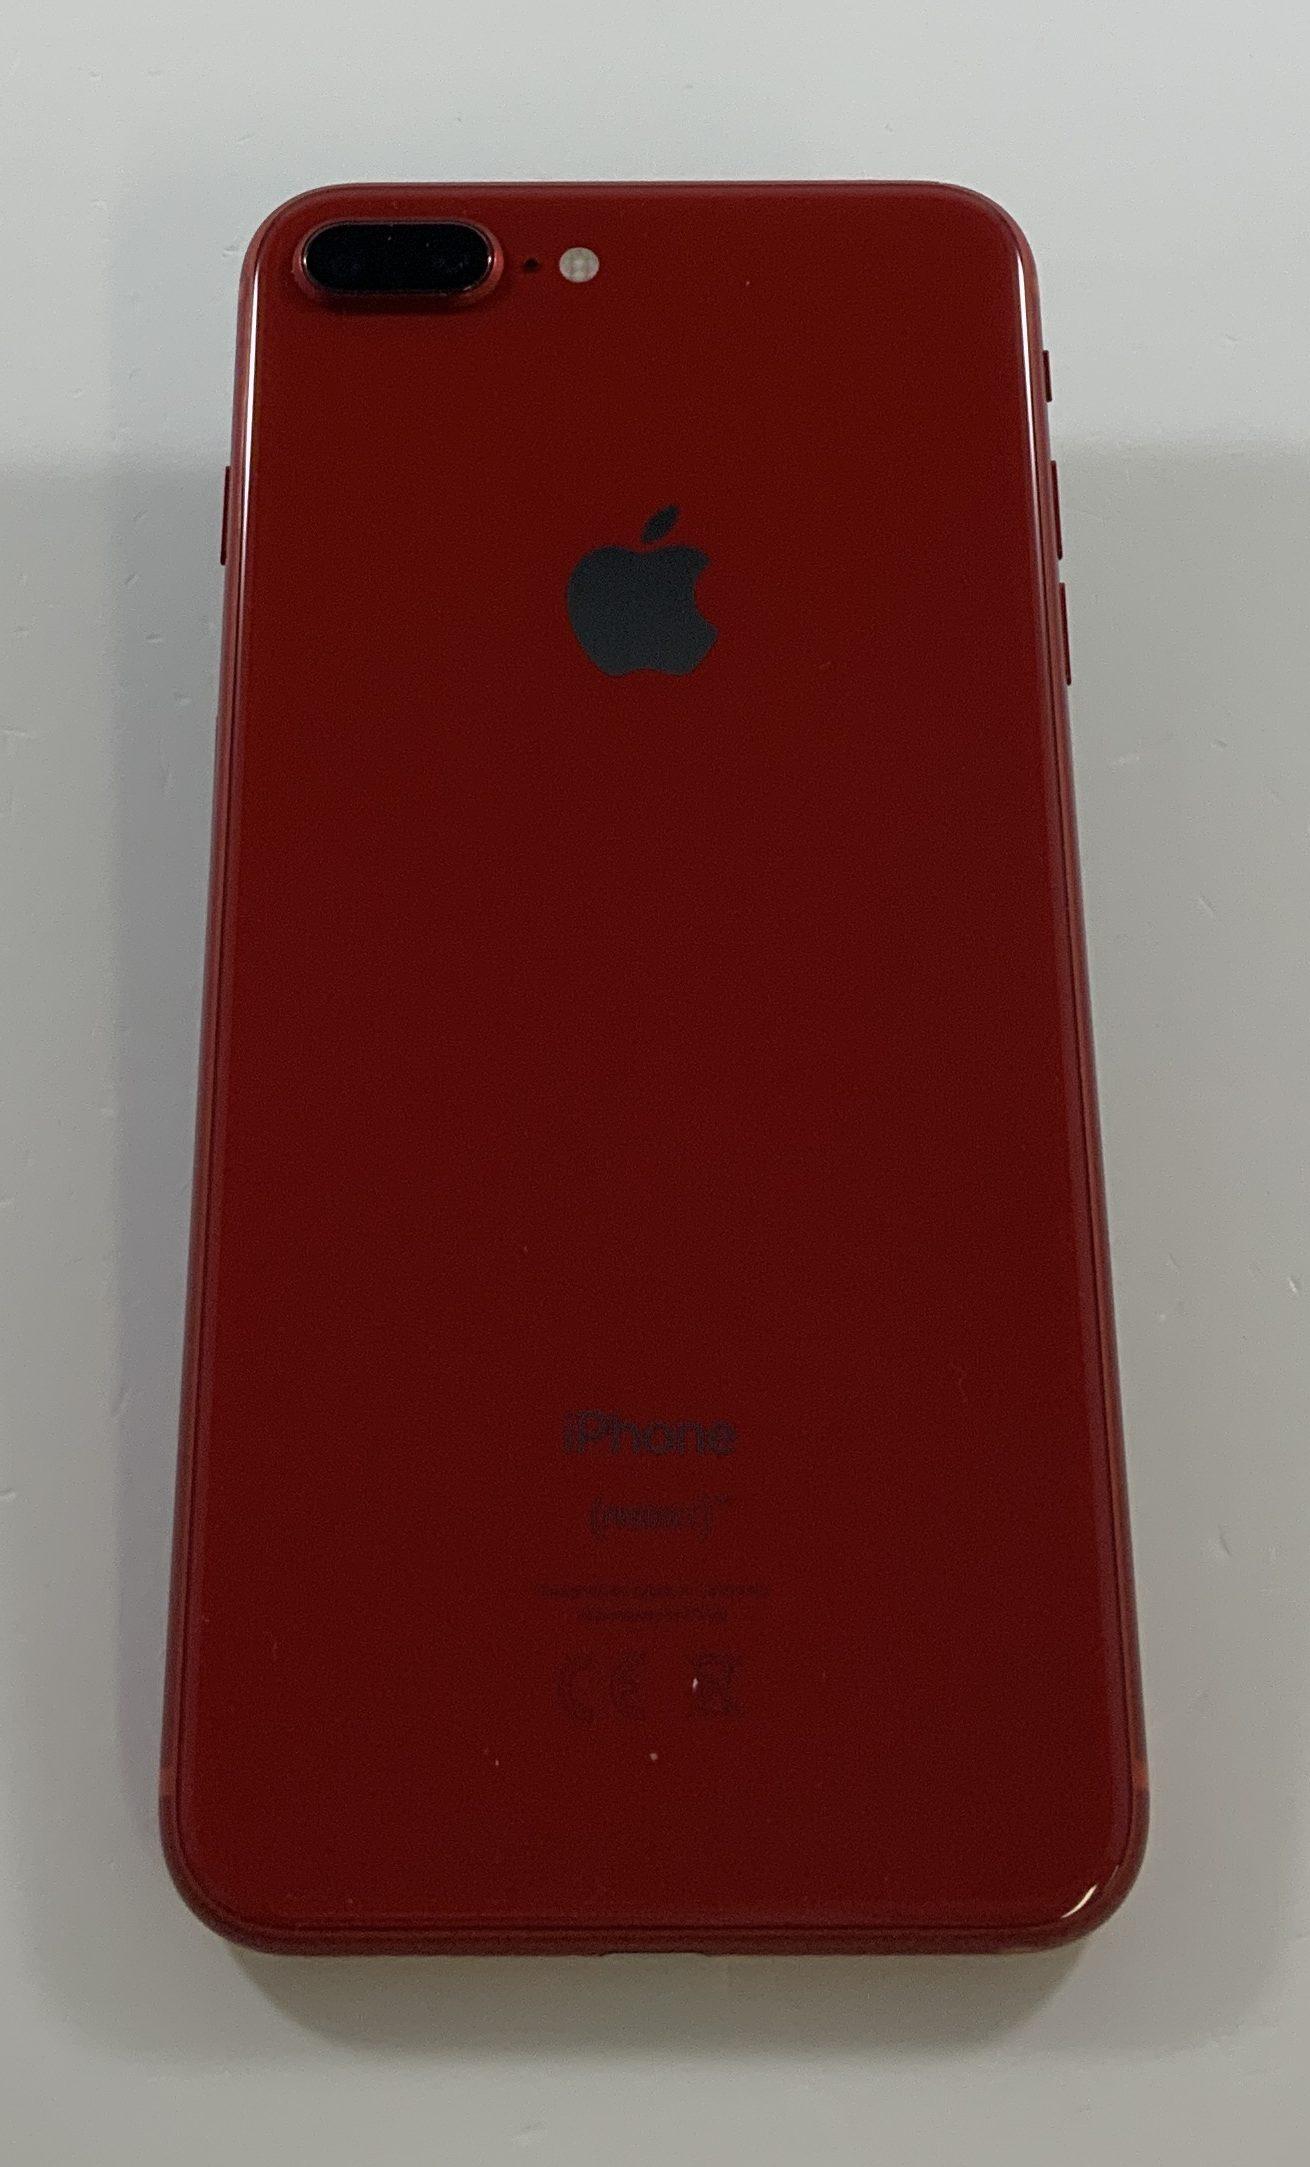 iPhone 8 Plus 256GB, 256GB, Red, obraz 2